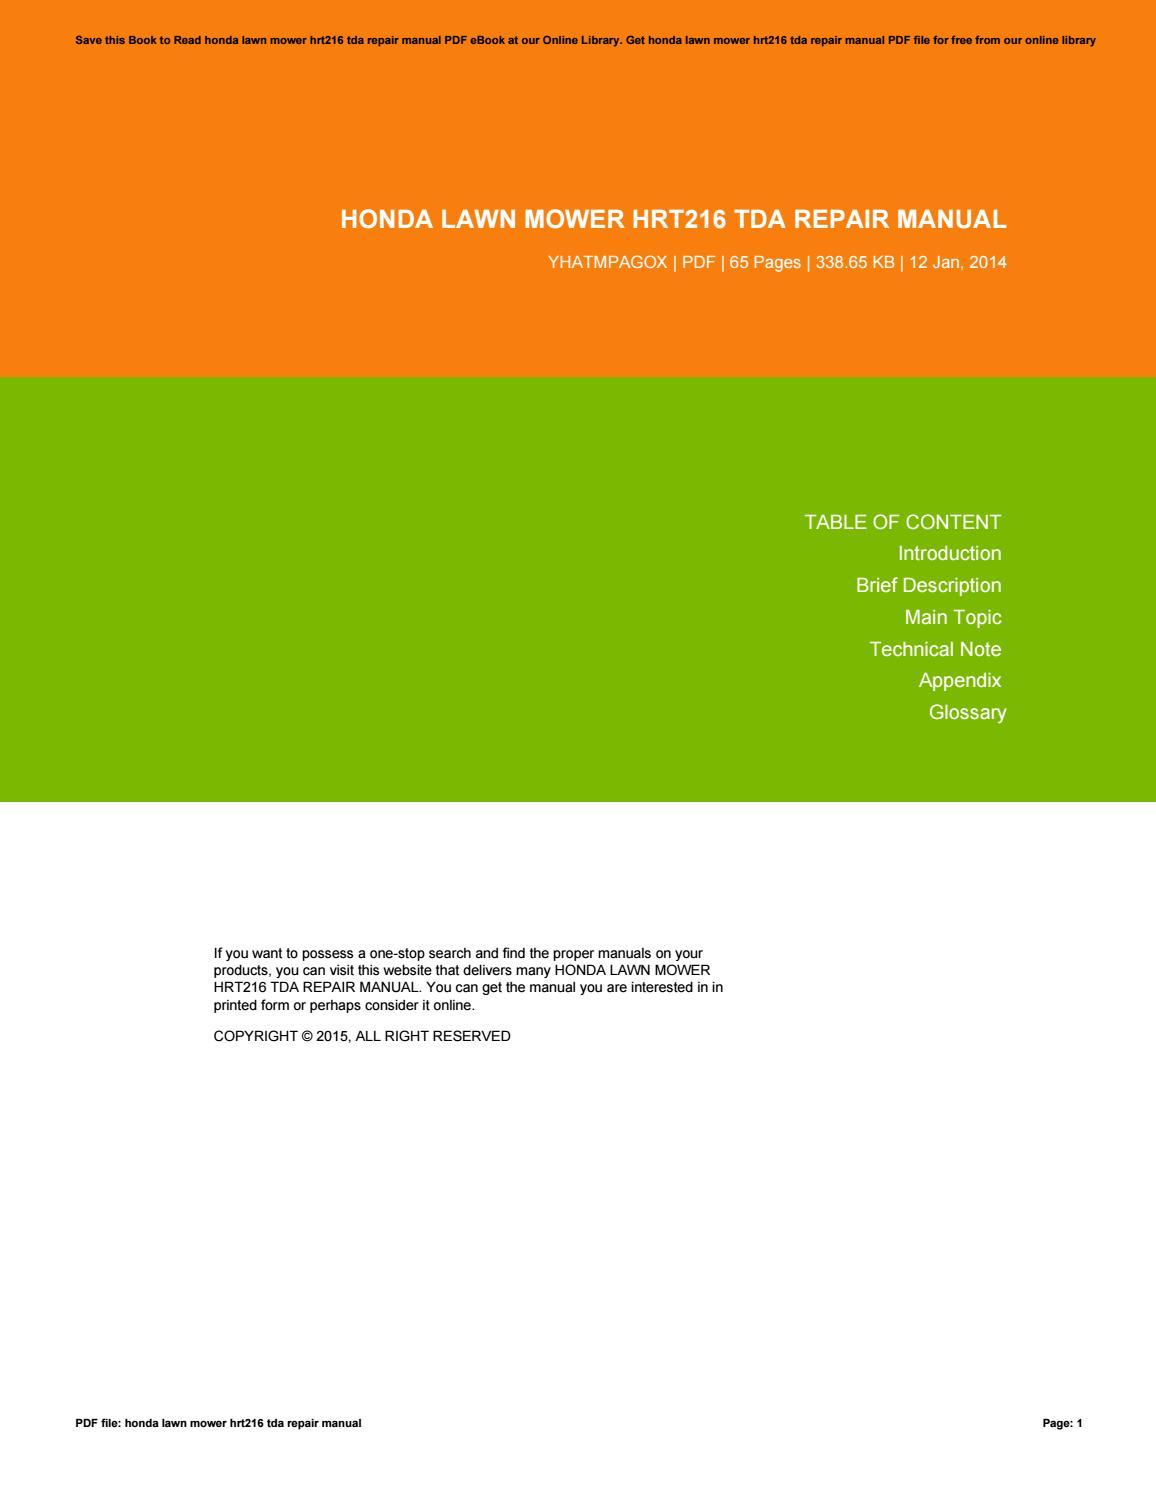 honda lawn mower hrt216 tda repair manual by nicholasbrown4016 issuu